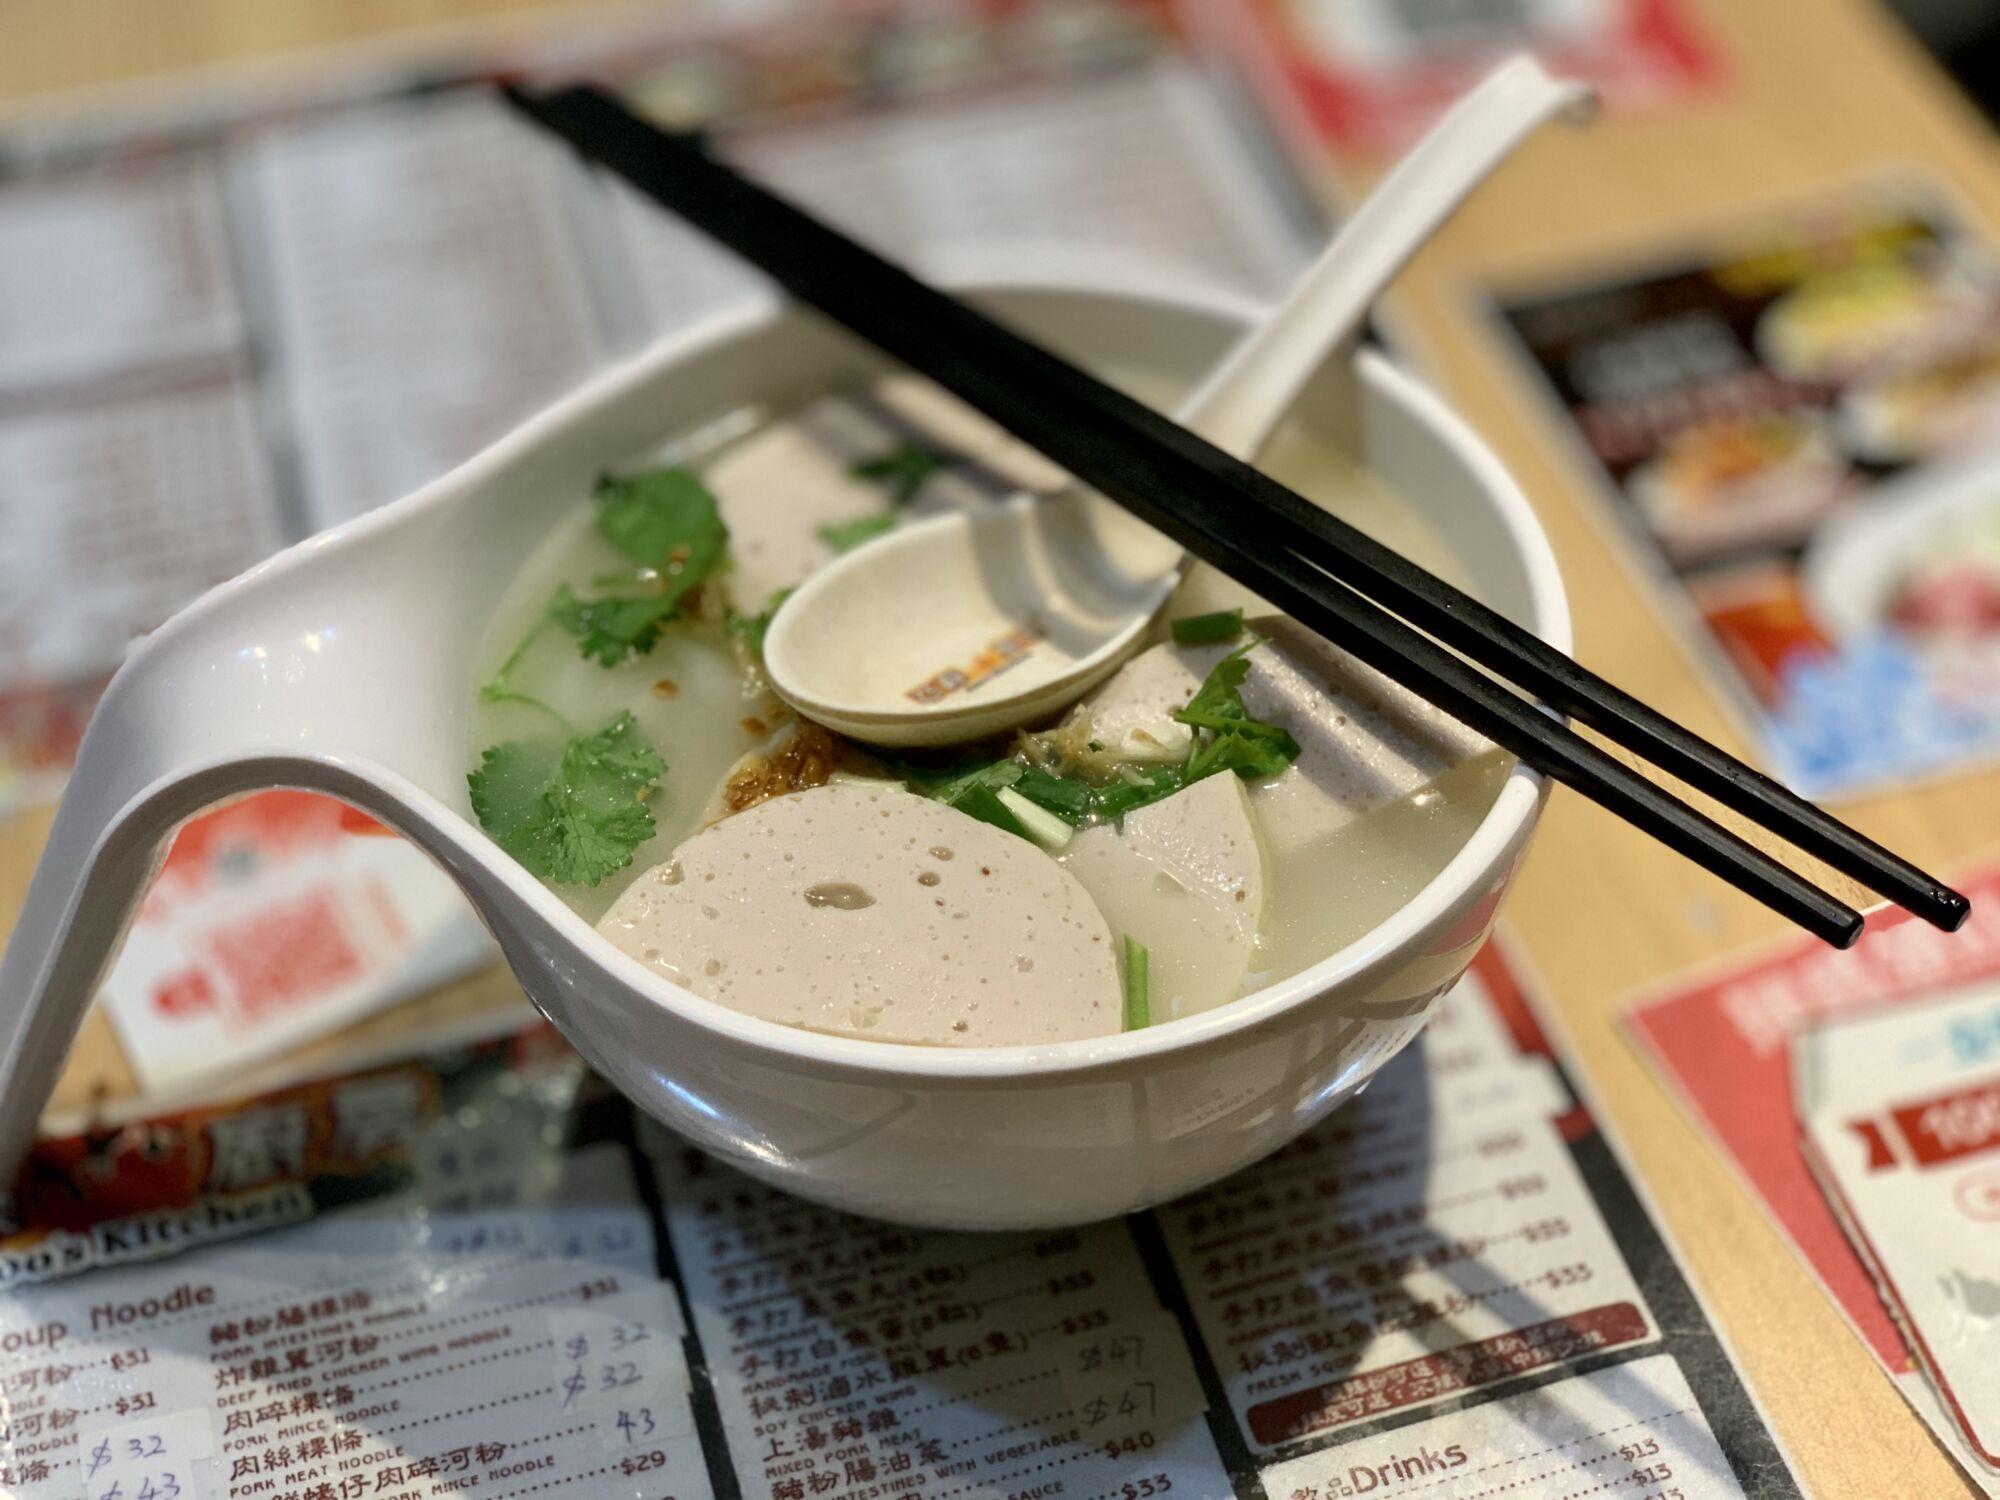 Soos Kitchen Pork Roll Noodles Macau Lifestyle